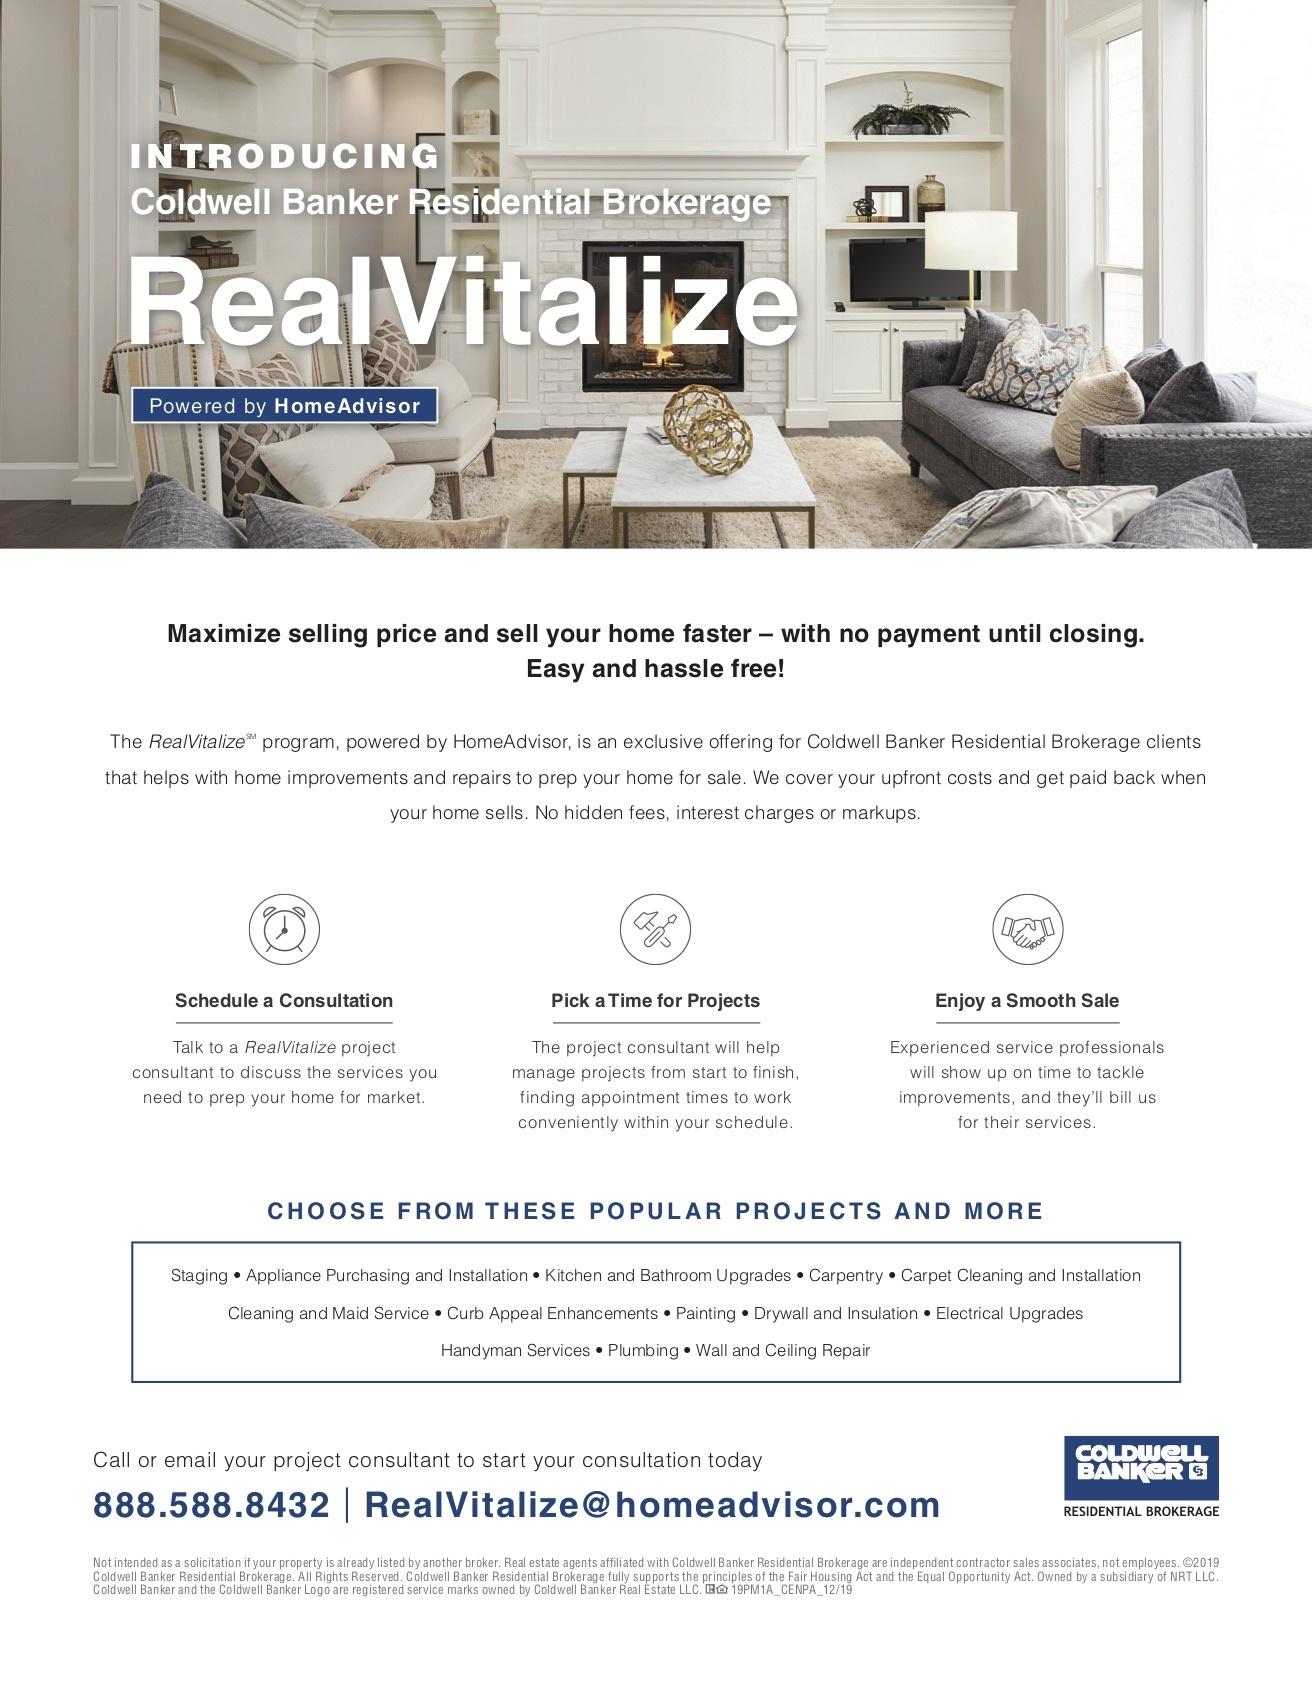 RealVitalize